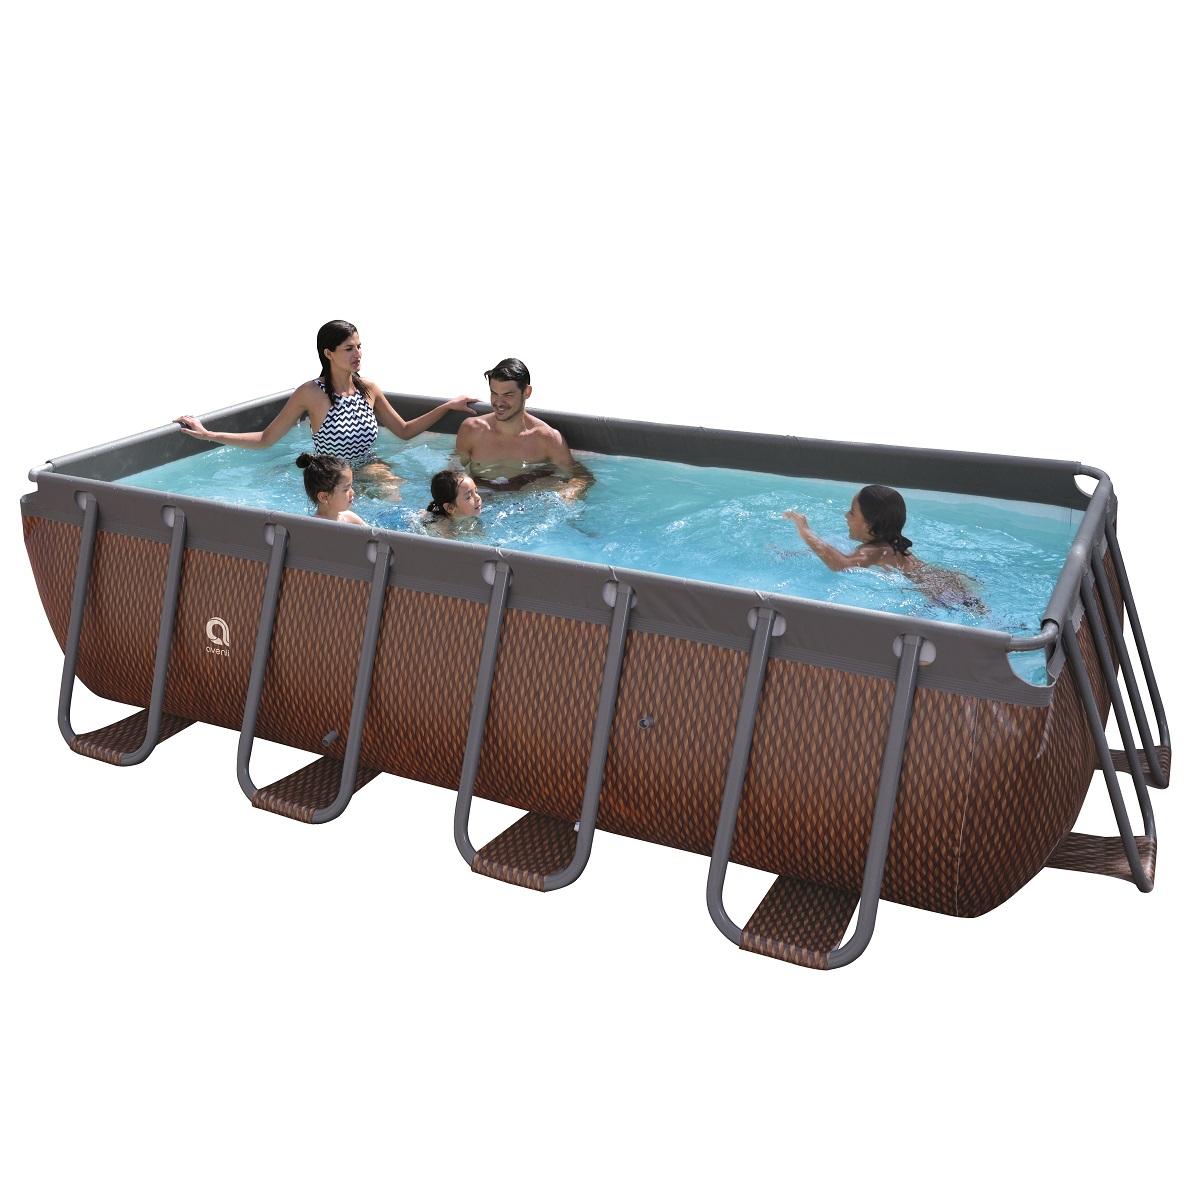 Bazén s pevnou stenou Passaat Rattan 400 x 200 x 99 cm s kartušovou filtráciou